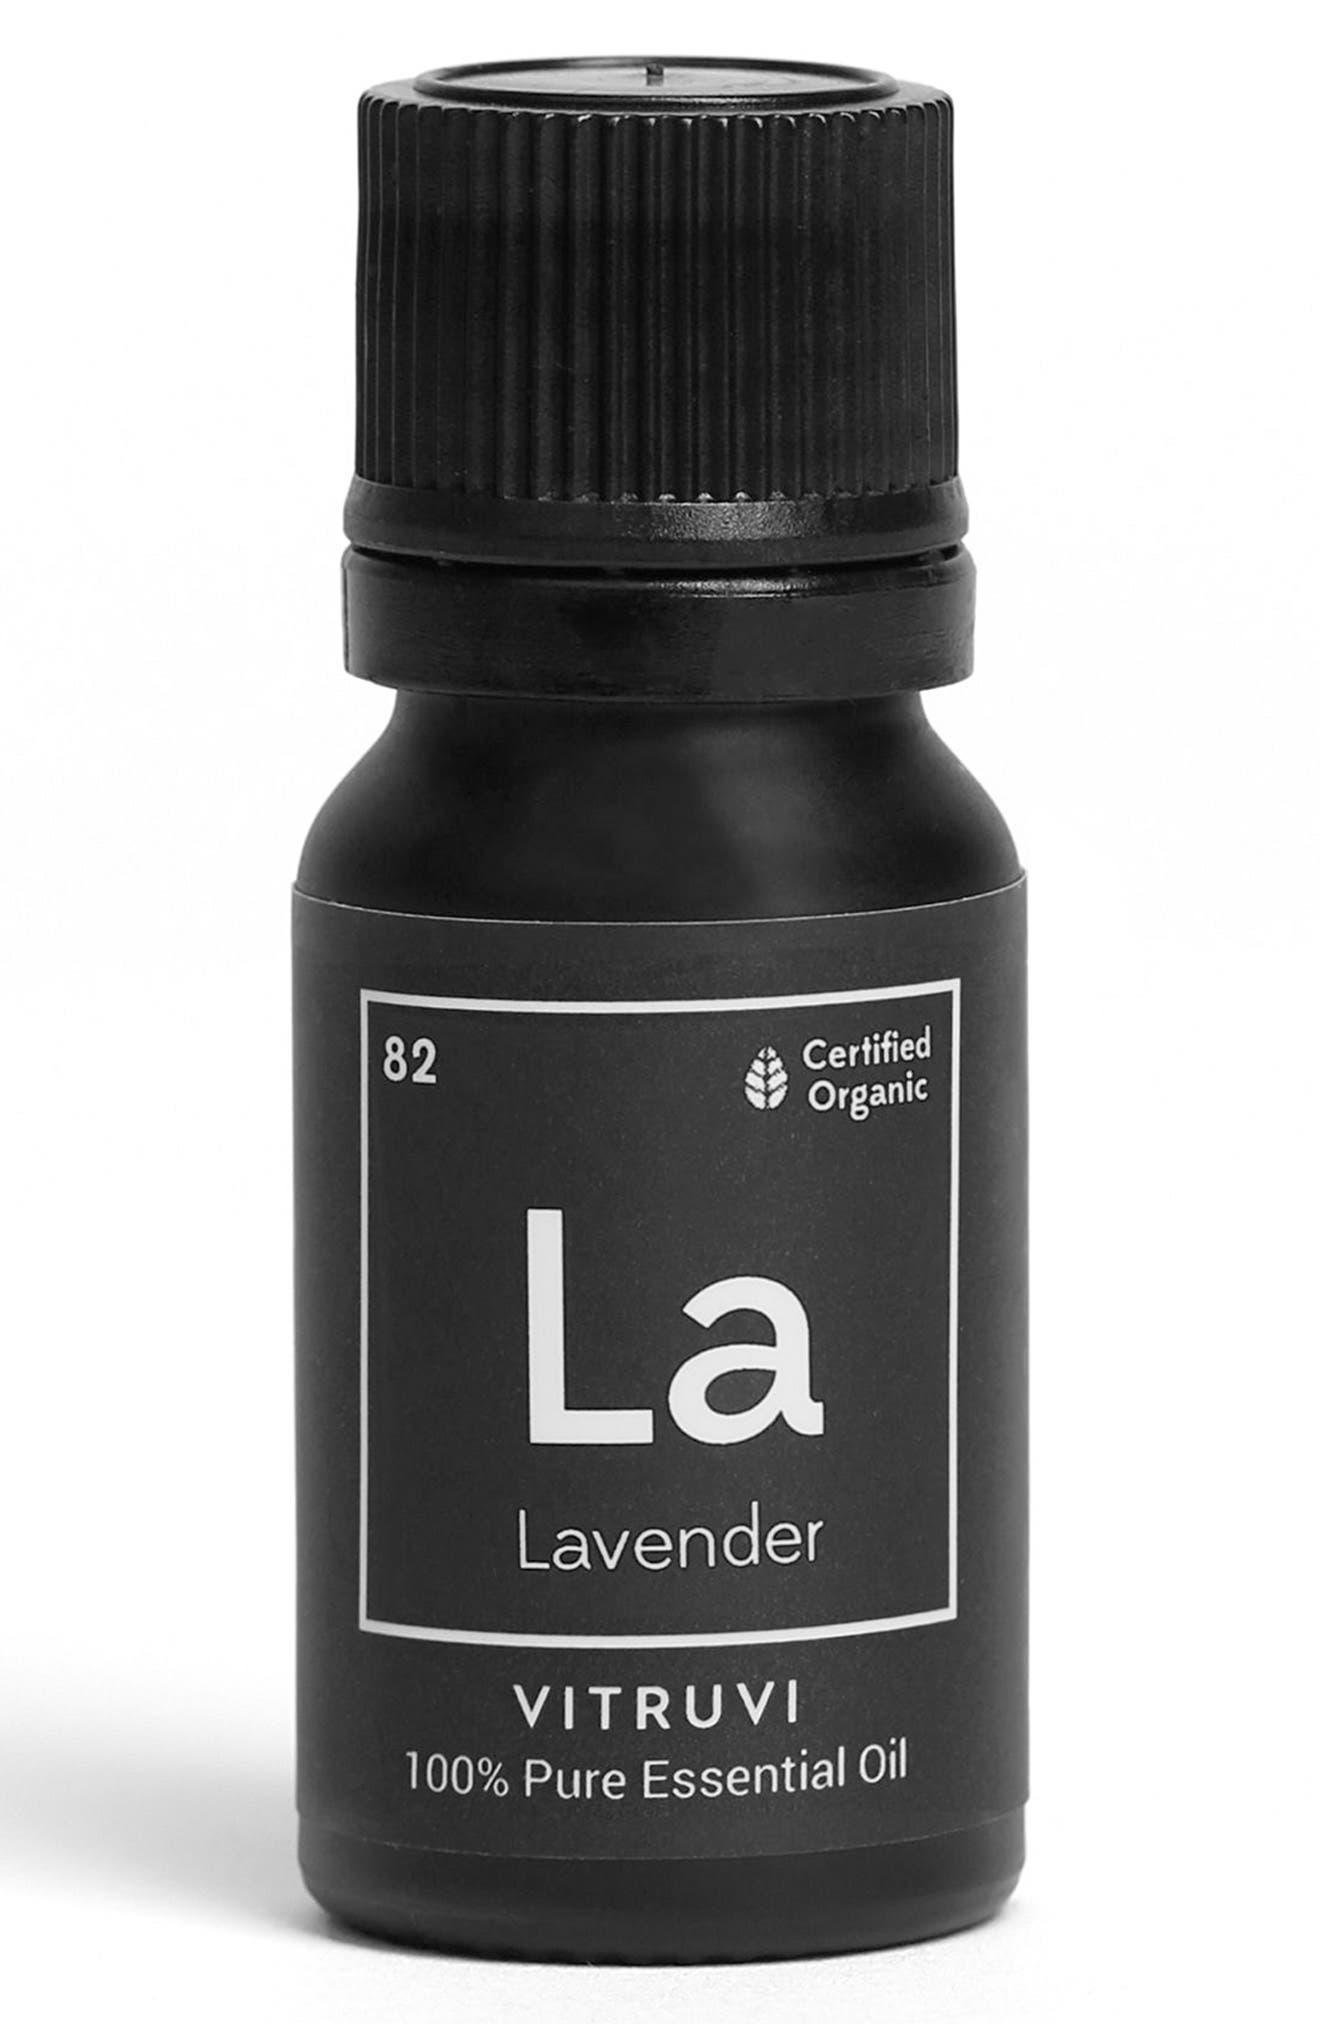 Alternate Image 1 Selected - Vitruvi Lavender Essential Oil